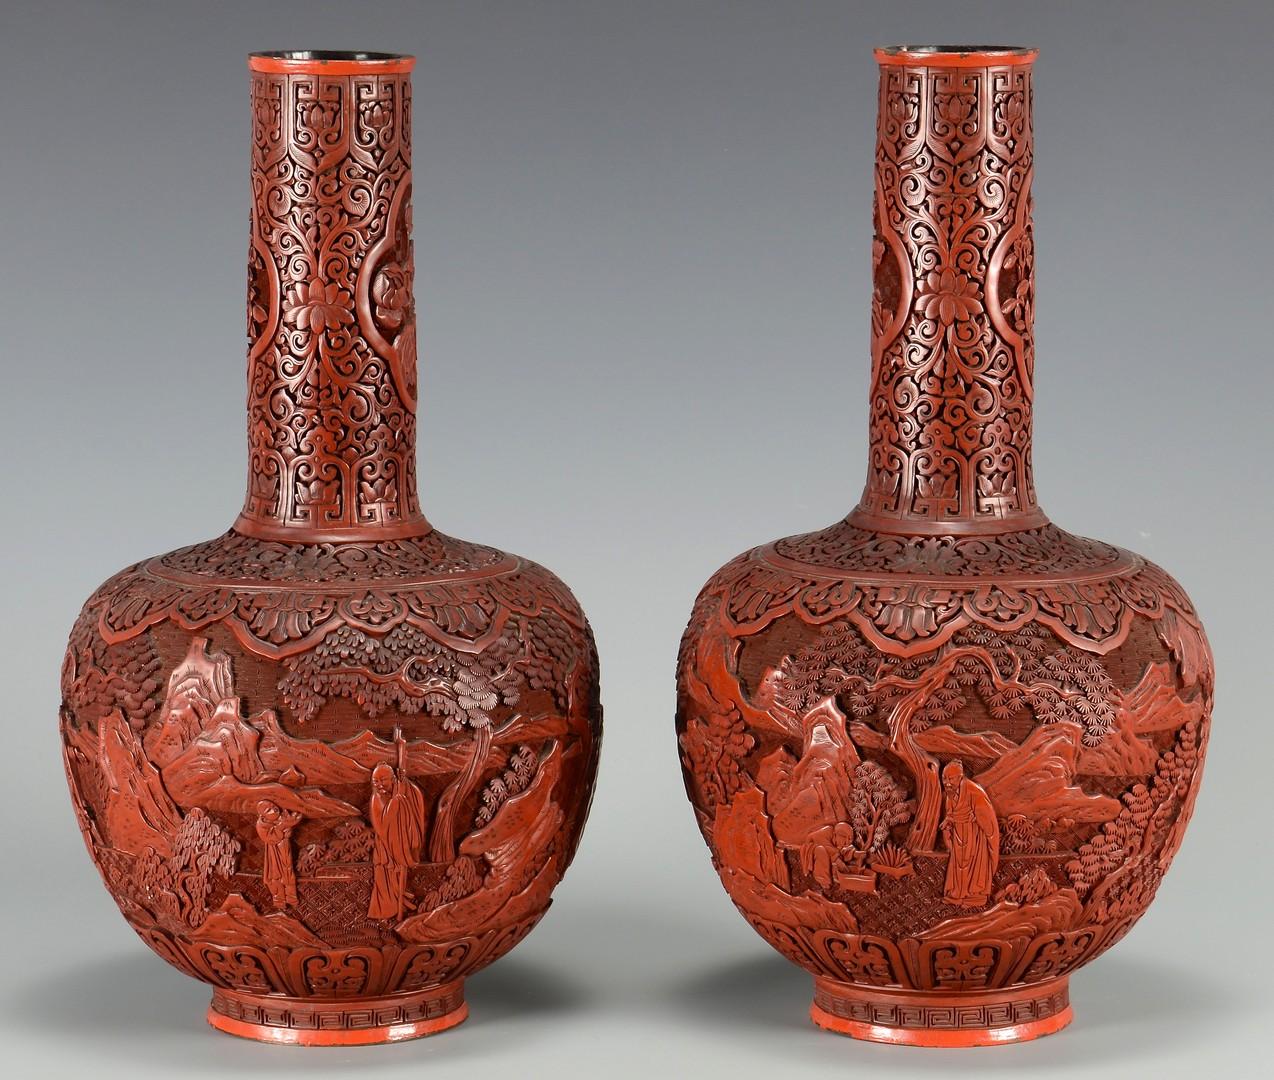 Lot 8: Pr. Chinese Cinnabar Bottle Form Vases